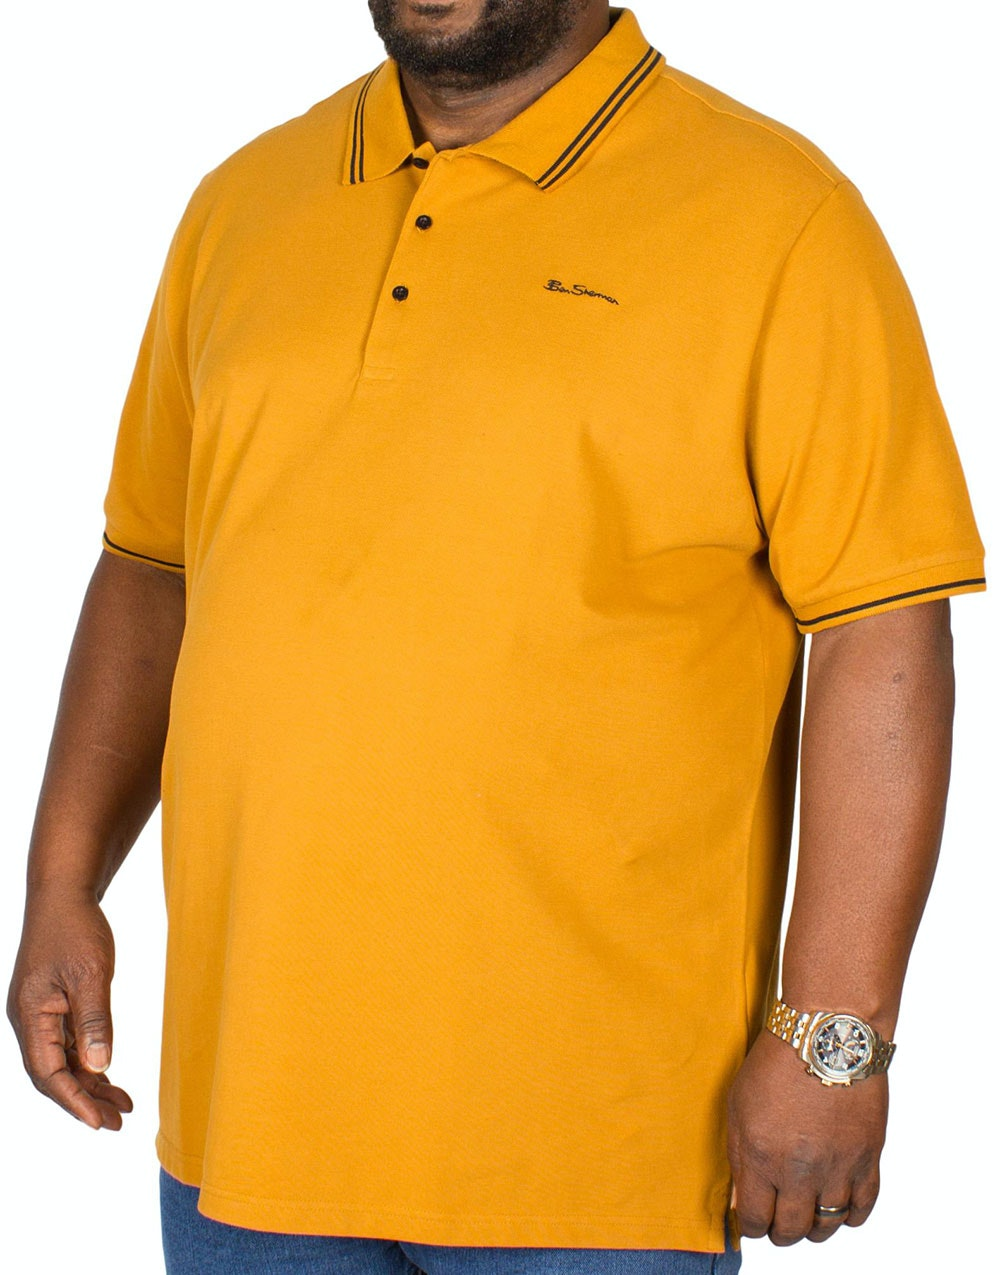 Ben Sherman Script Tipped Polo Shirt Gold